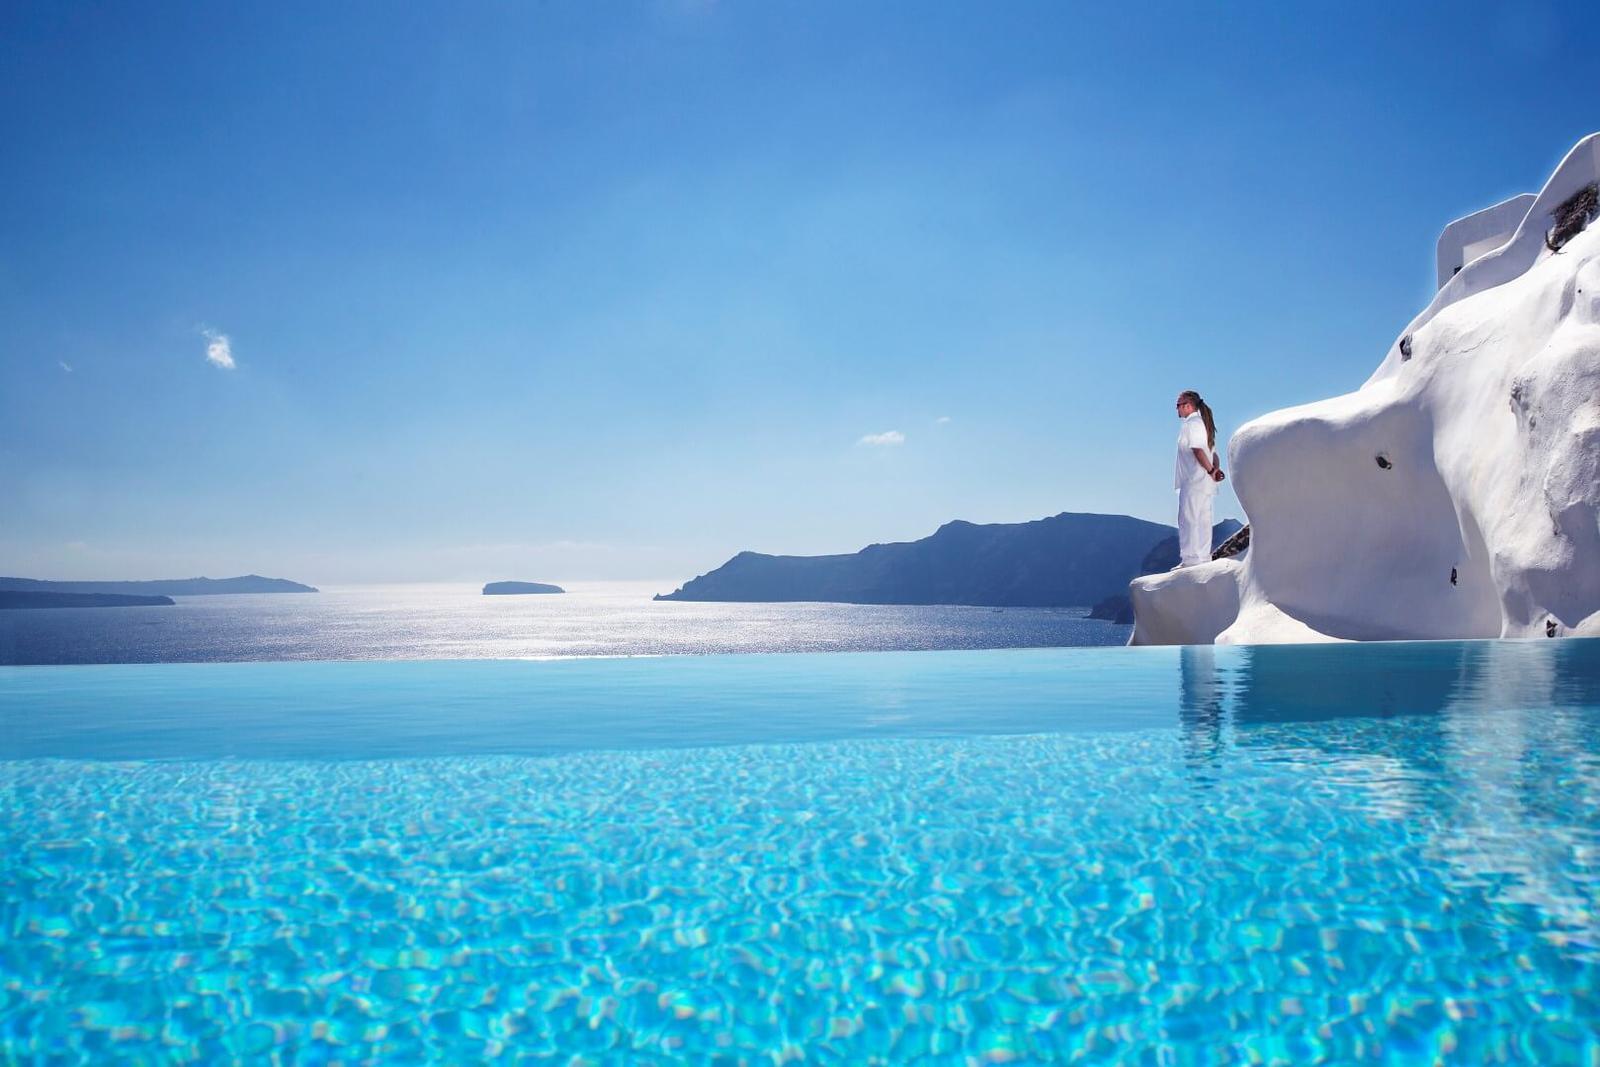 hoteles con piscina en Grecia gr pool